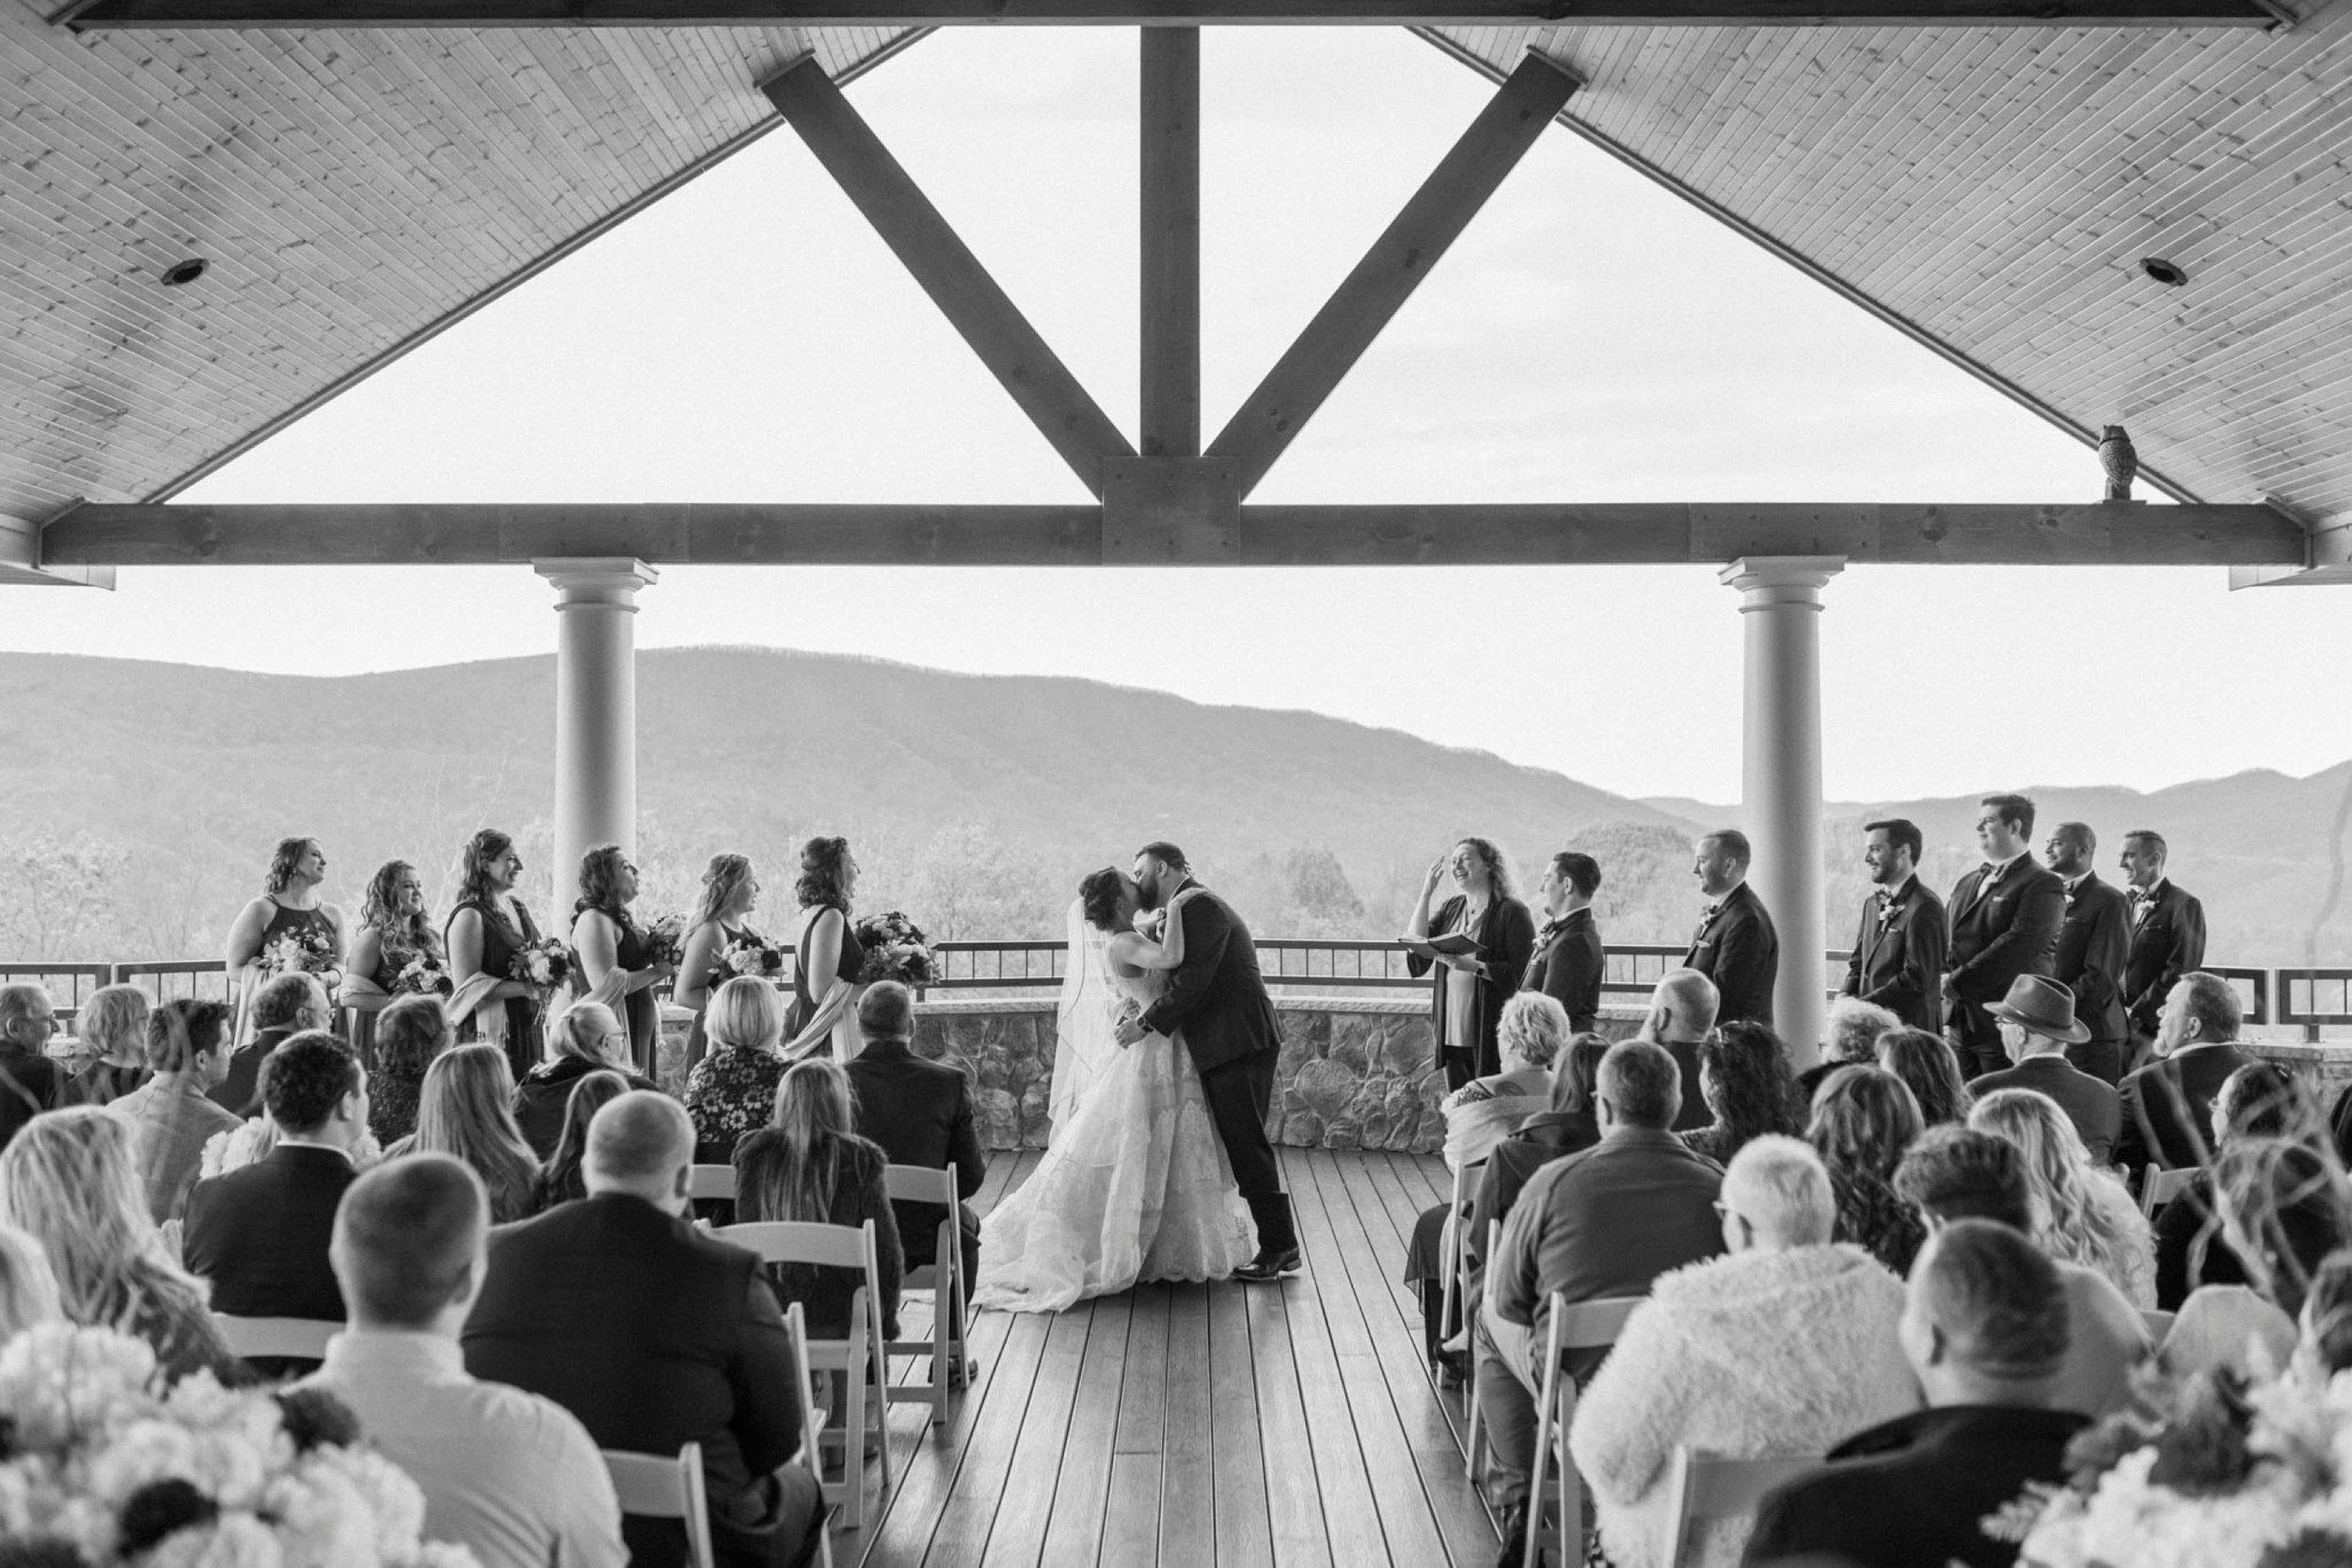 IrvineEstate_LexingtonVA_Wedding_FallWedding_VirginiaWeddingPhotographer 66.jpg